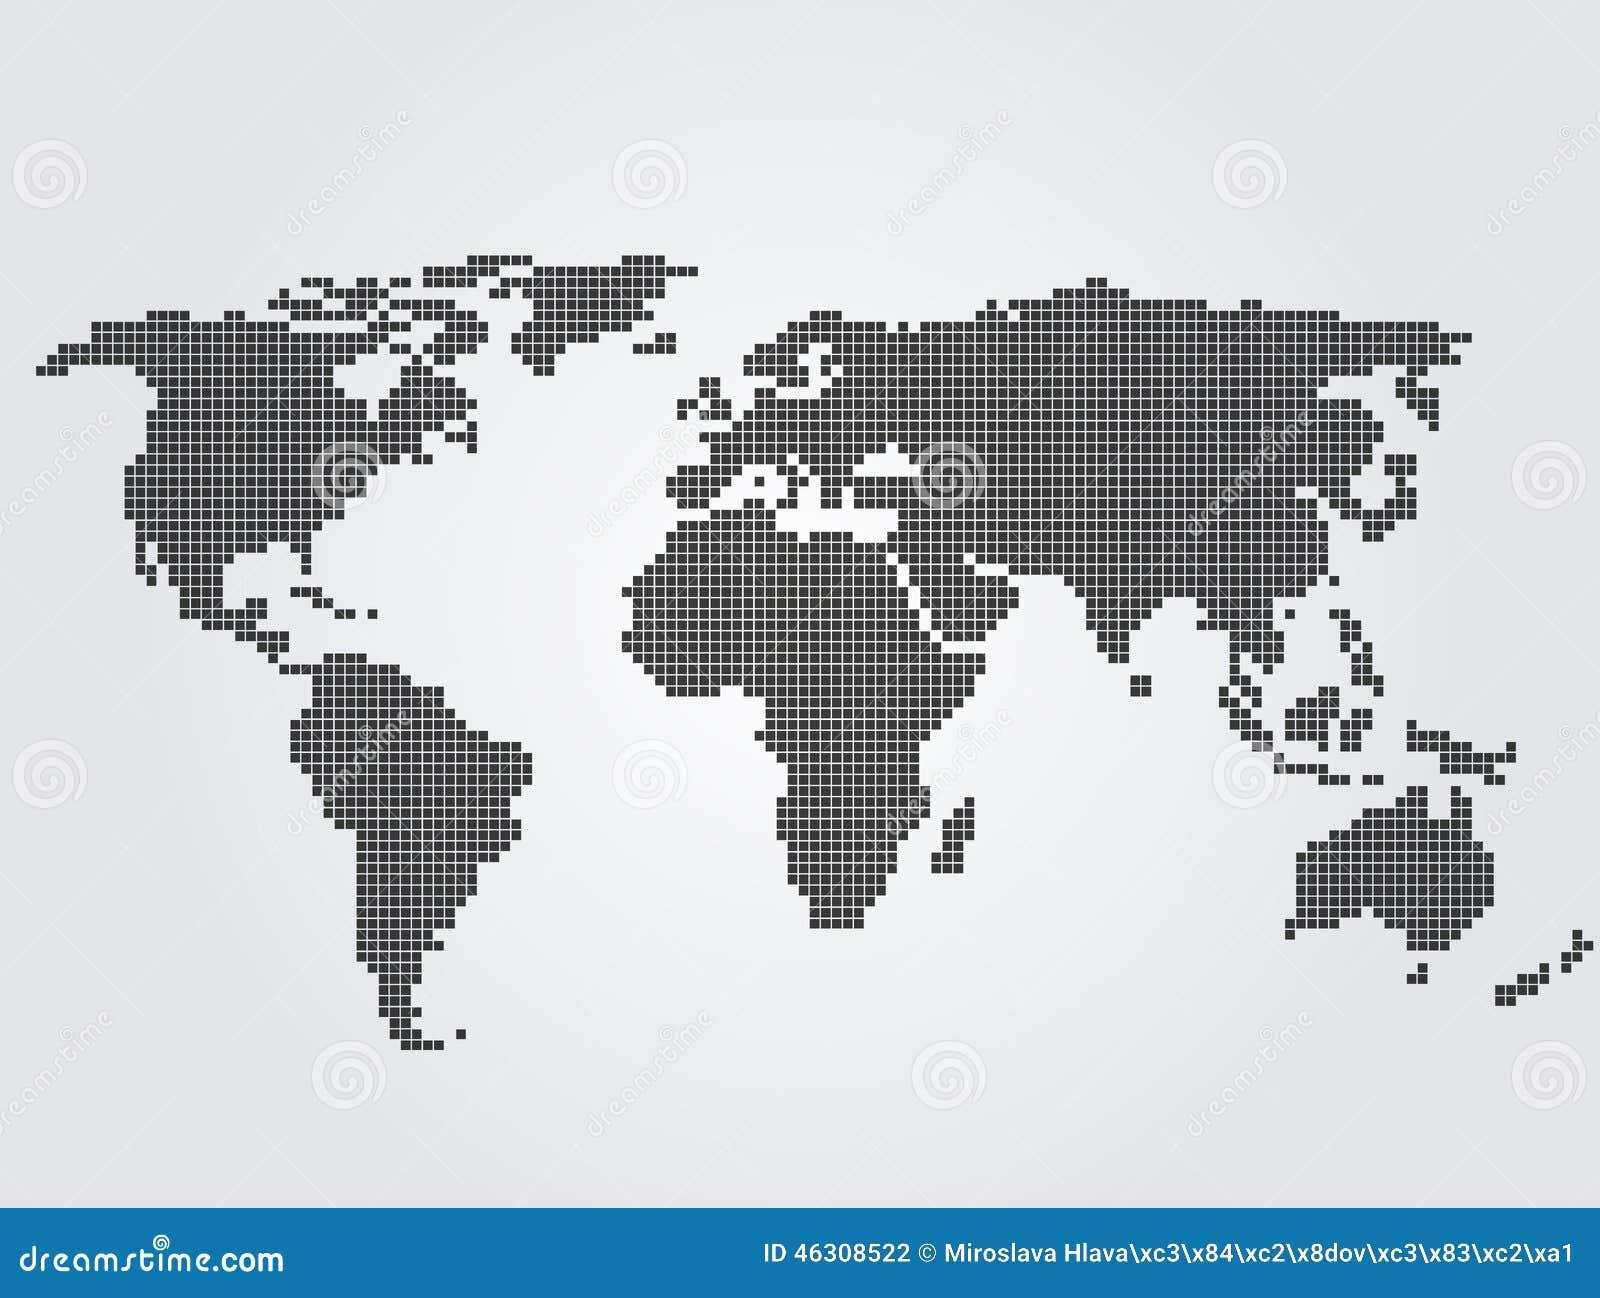 World map stock vector illustration of modern europe 46308522 download world map stock vector illustration of modern europe 46308522 gumiabroncs Image collections